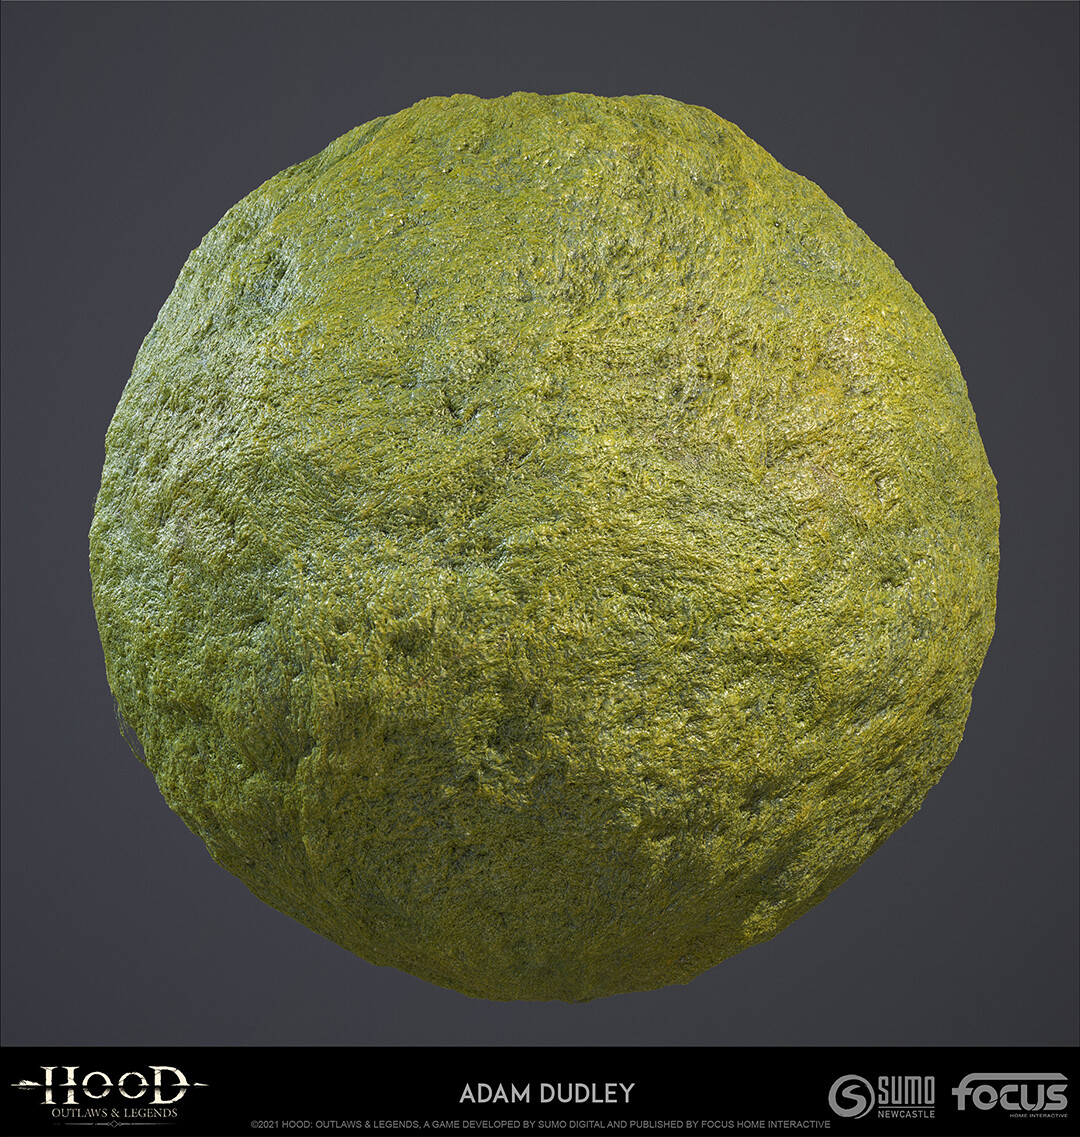 Algae - Photoshop/Substance B2M/Quixel Mixer